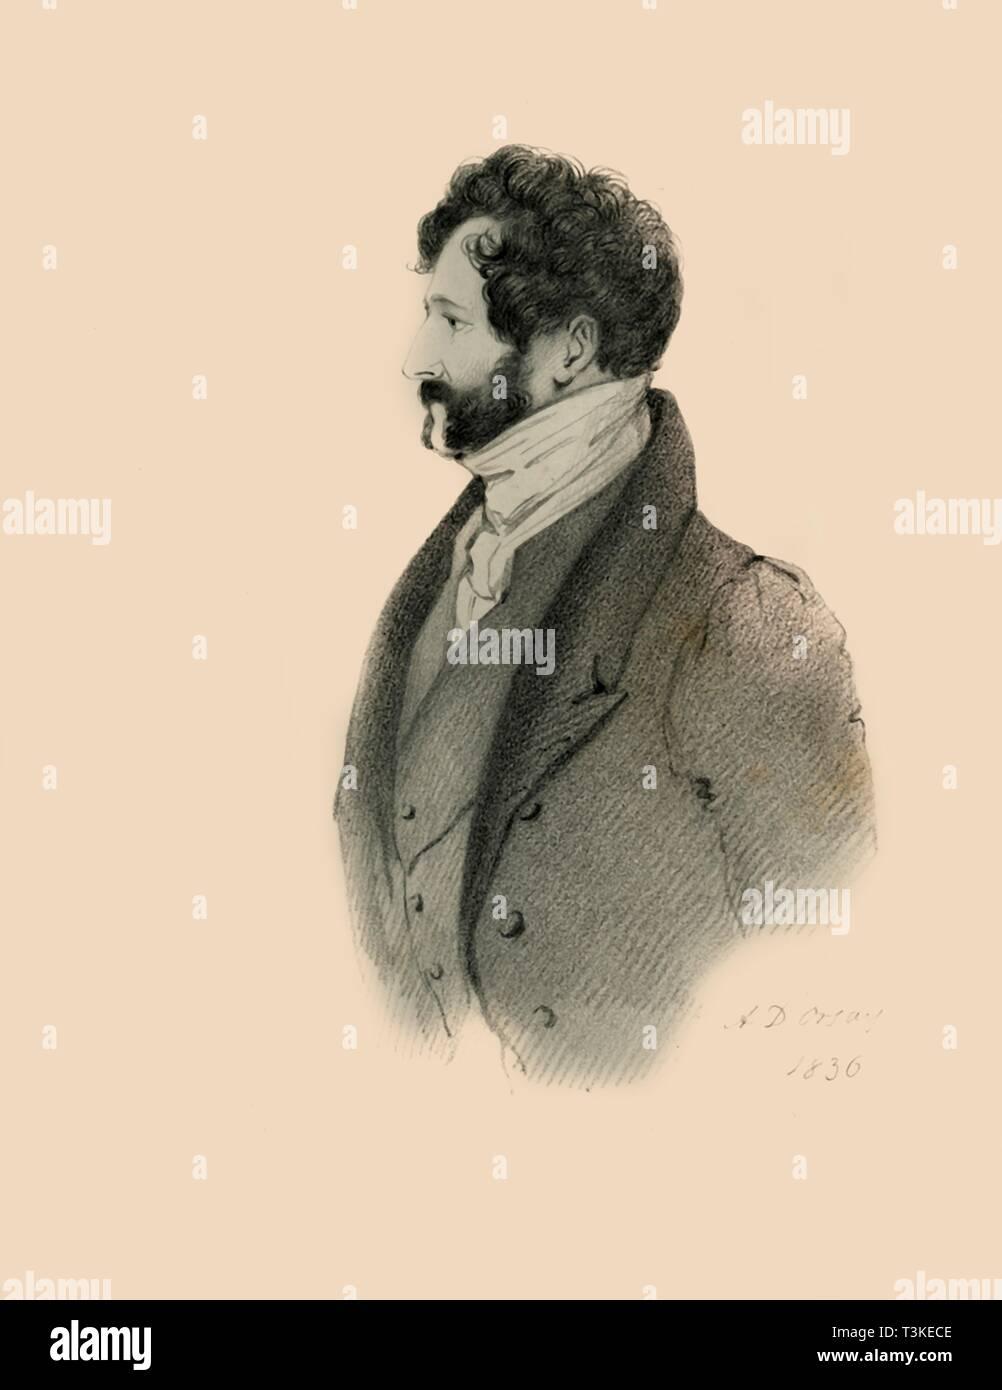 Lincoln Stanhope, 1836. Creator: Richard James Lane. - Stock Image